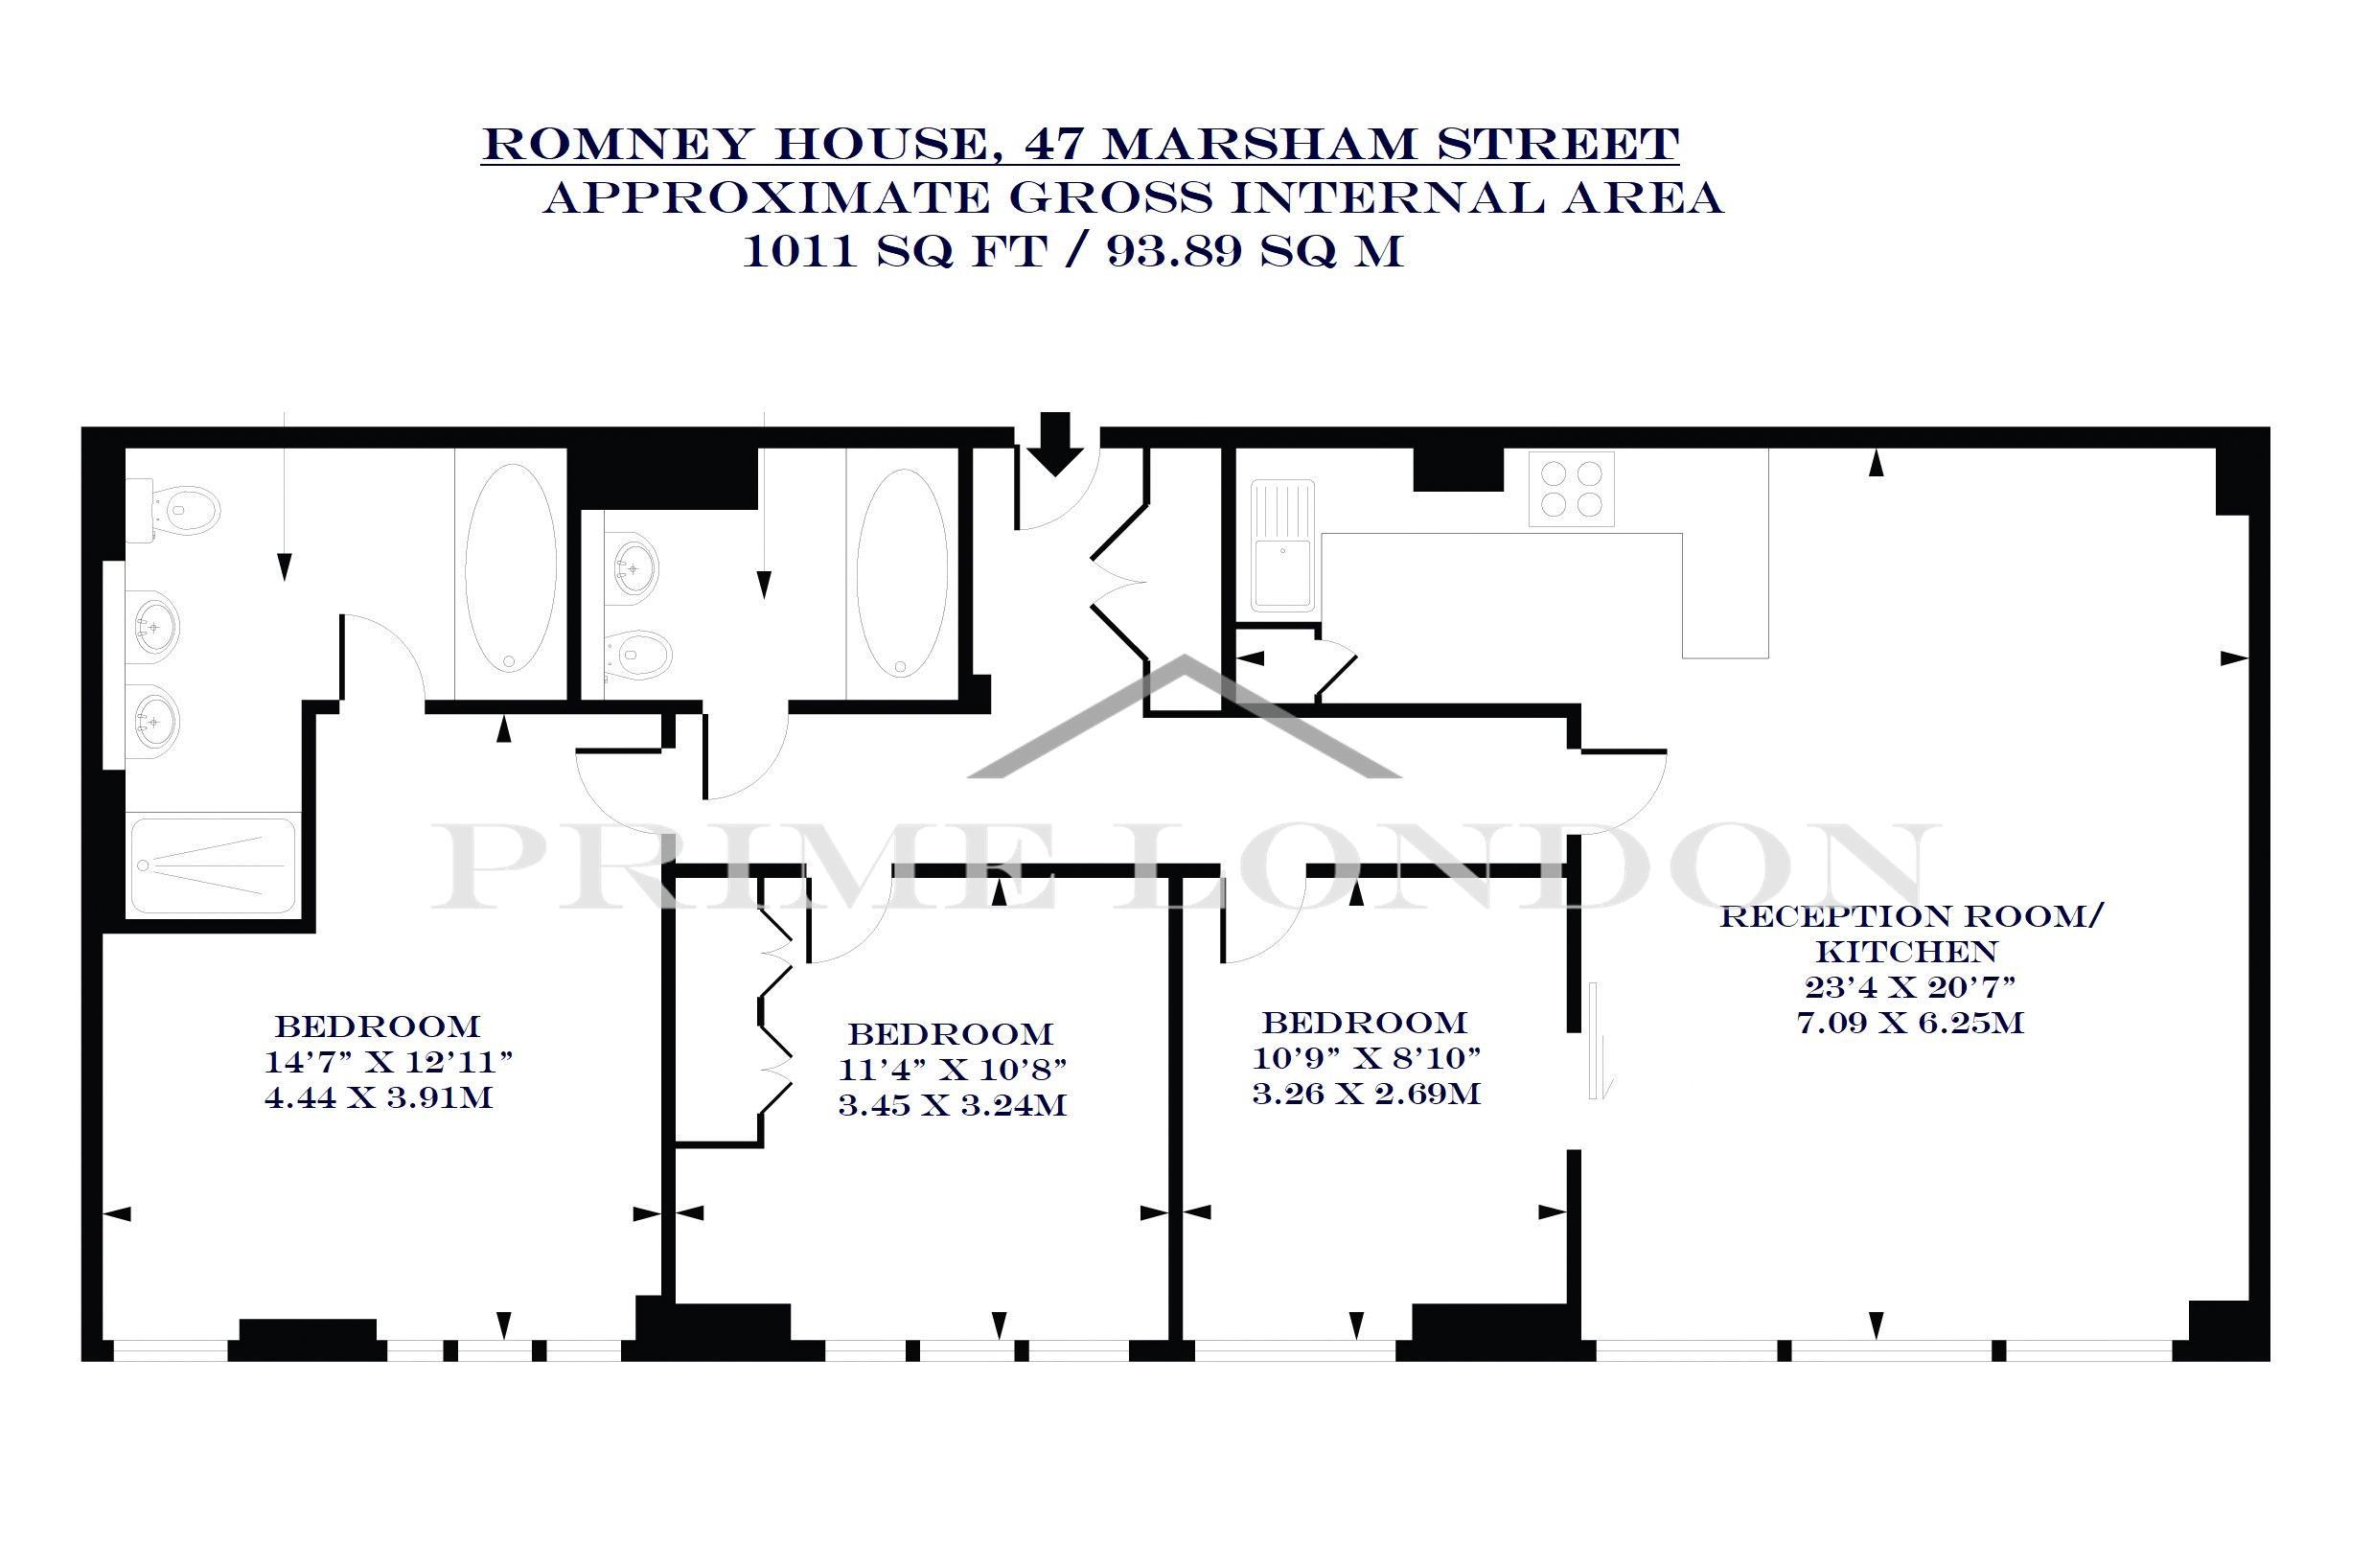 Romney House 47 Marsham Street